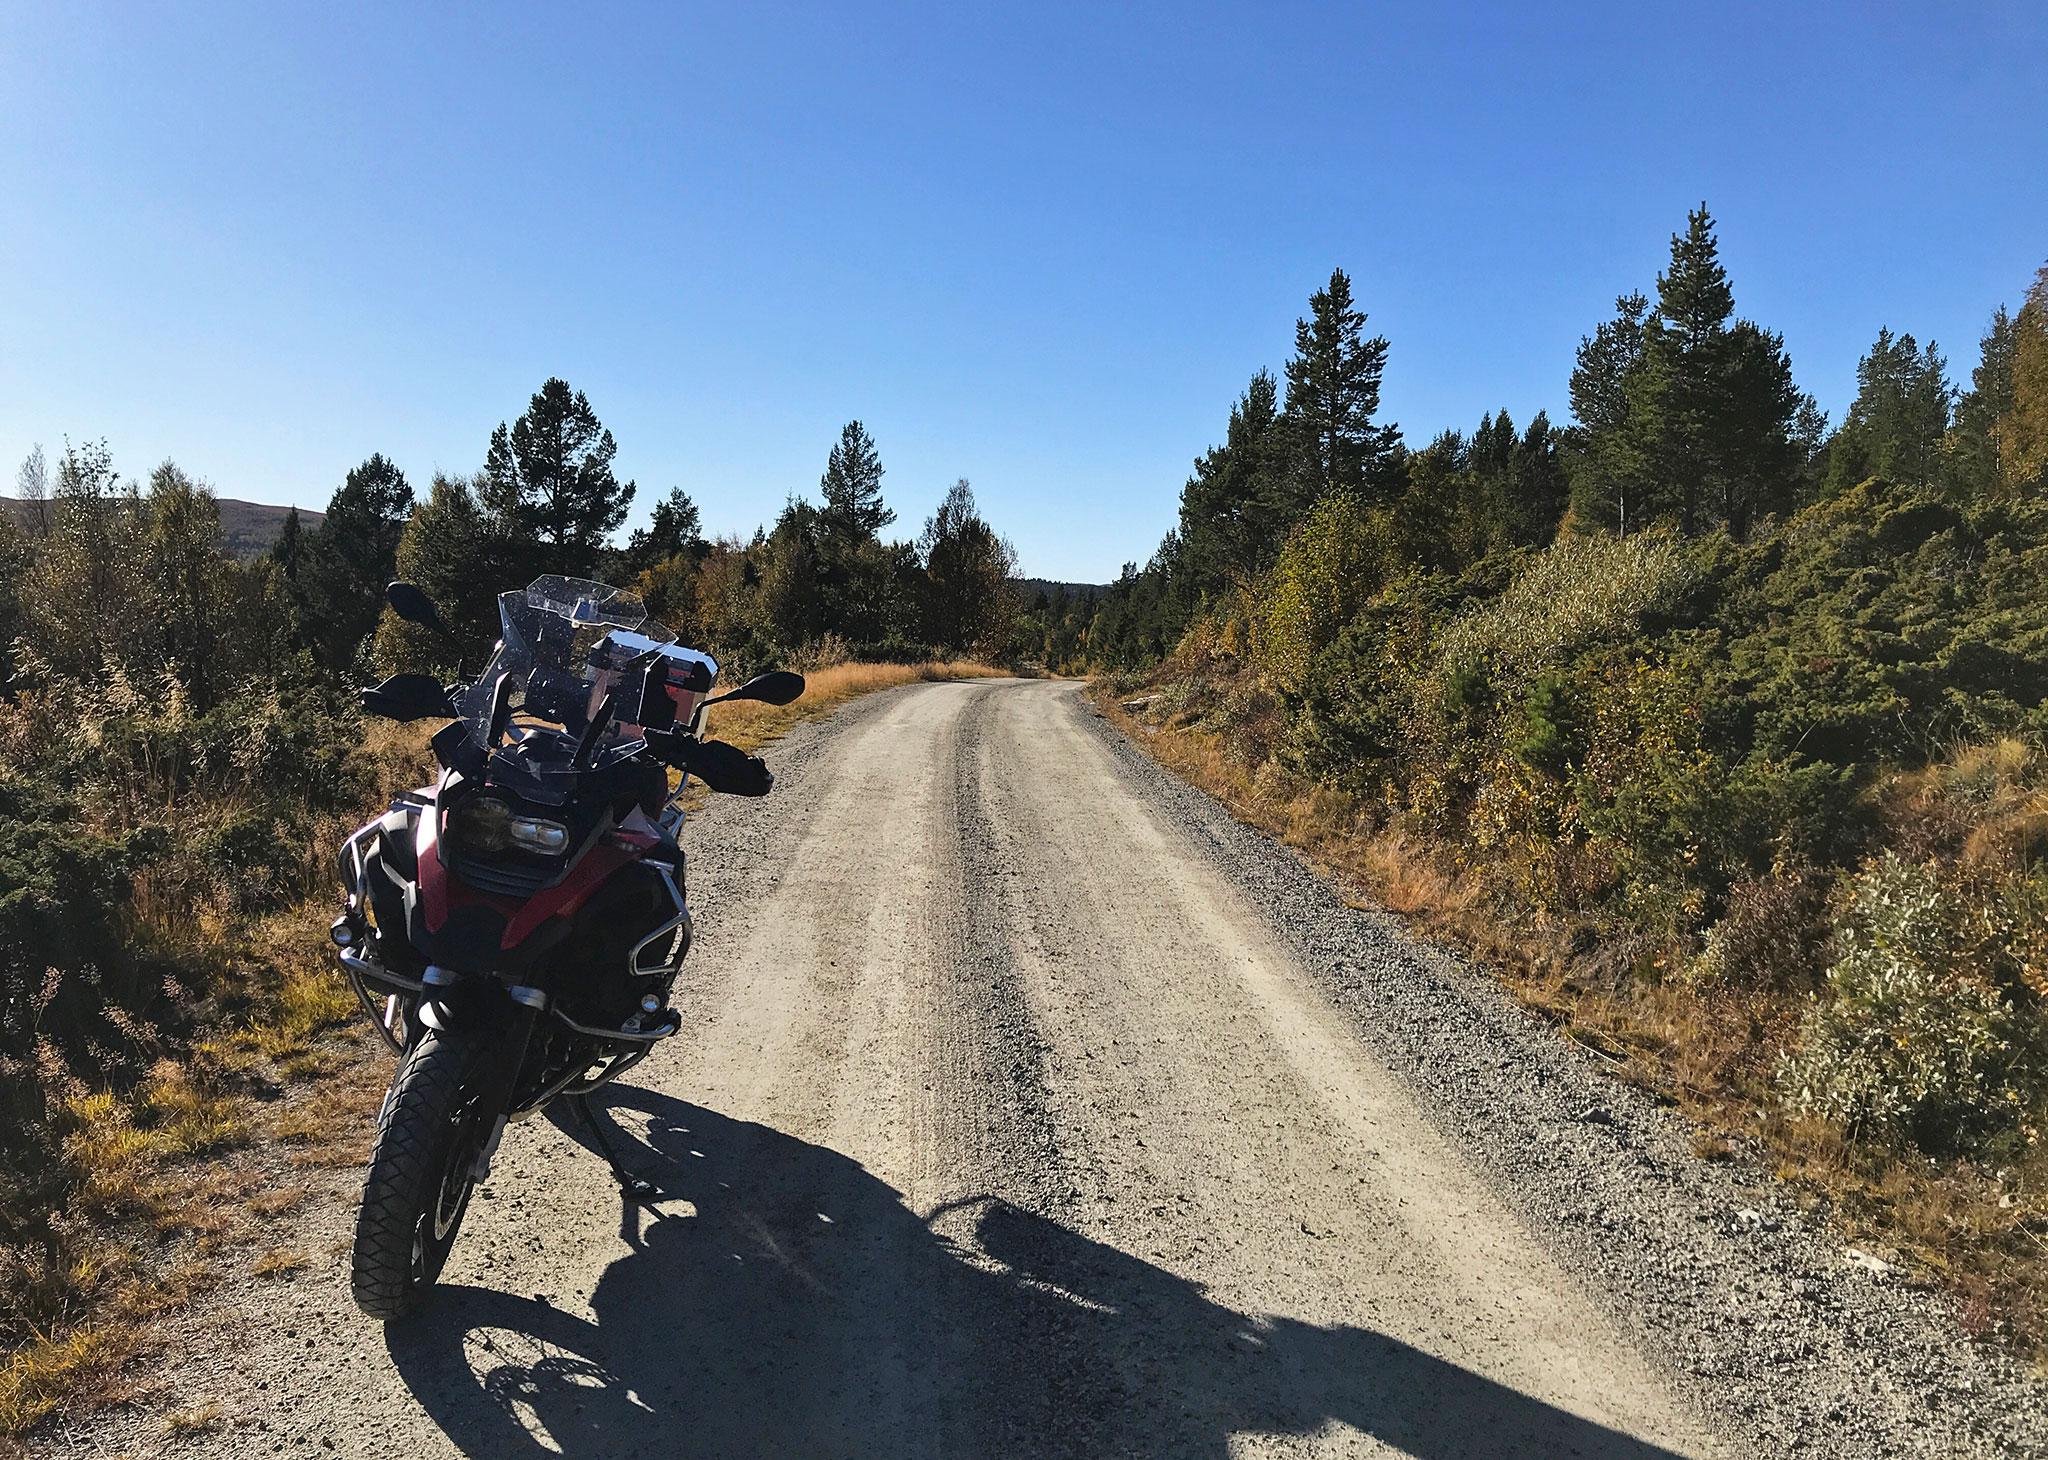 A perfect gravel road